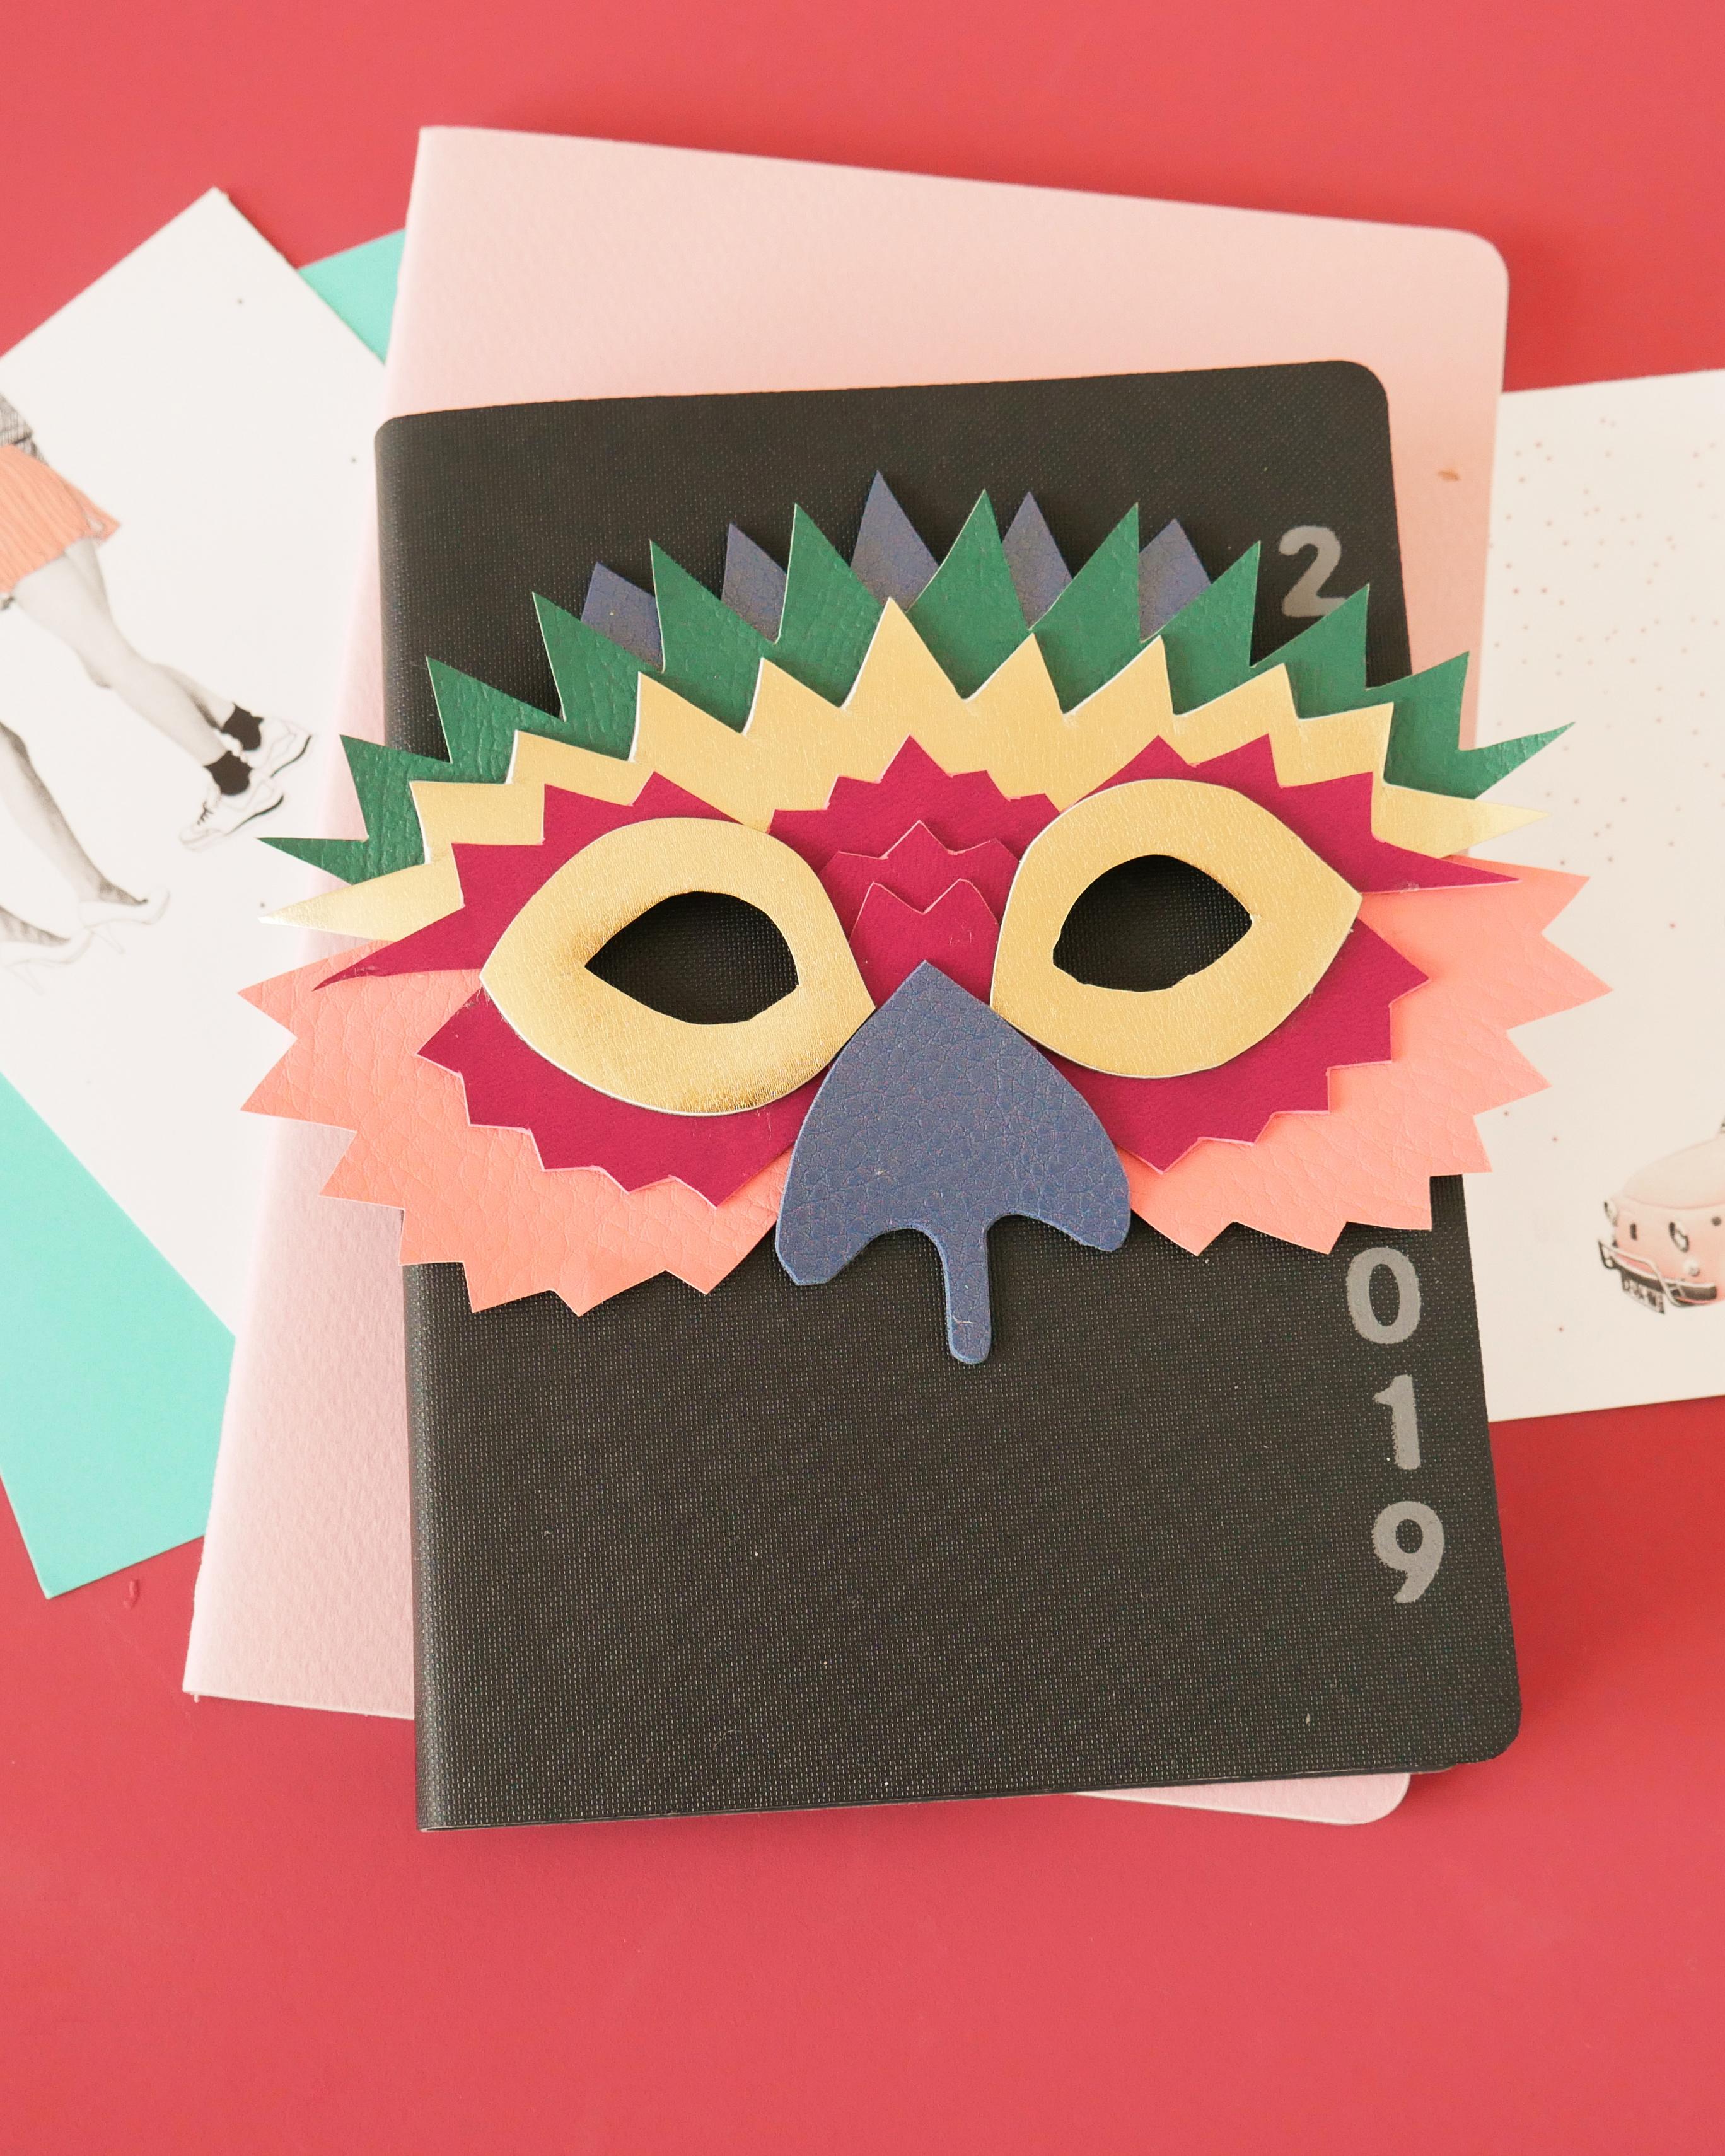 DIY – Un masque pour le carnaval en cuir